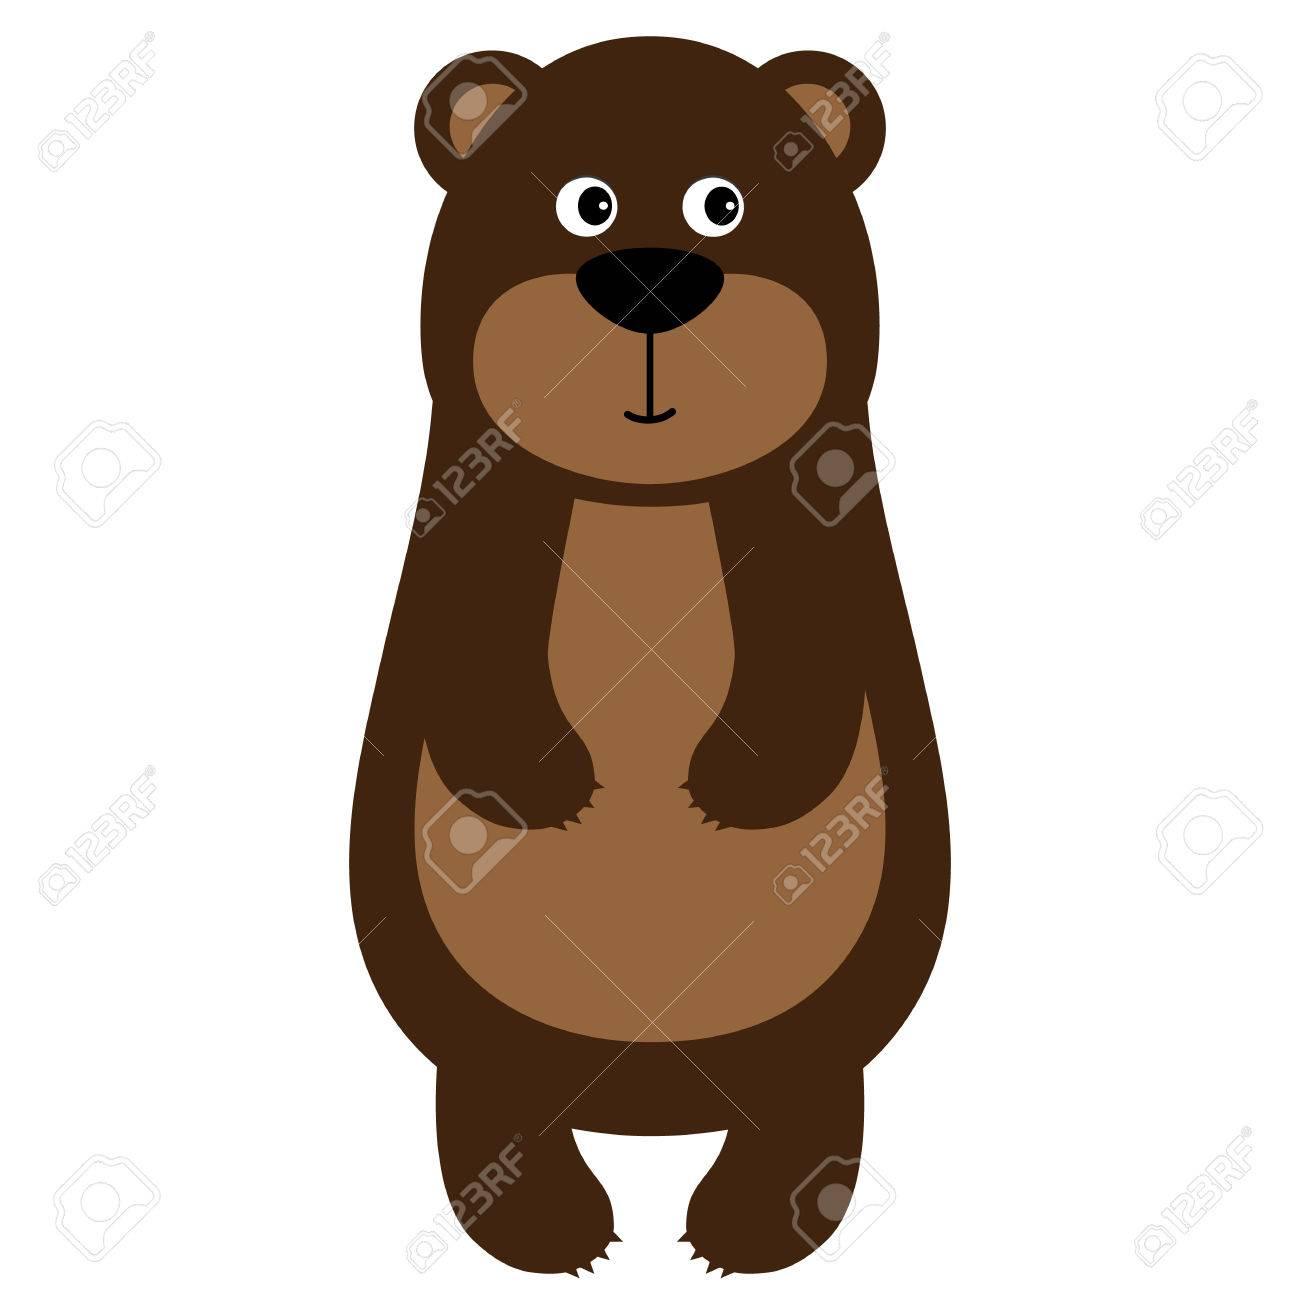 A Vector Cute Cartoon Baby Bear Clipart Vector Illustration Royalty Free Cliparts Vectors And Stock Illustration Image 81053562